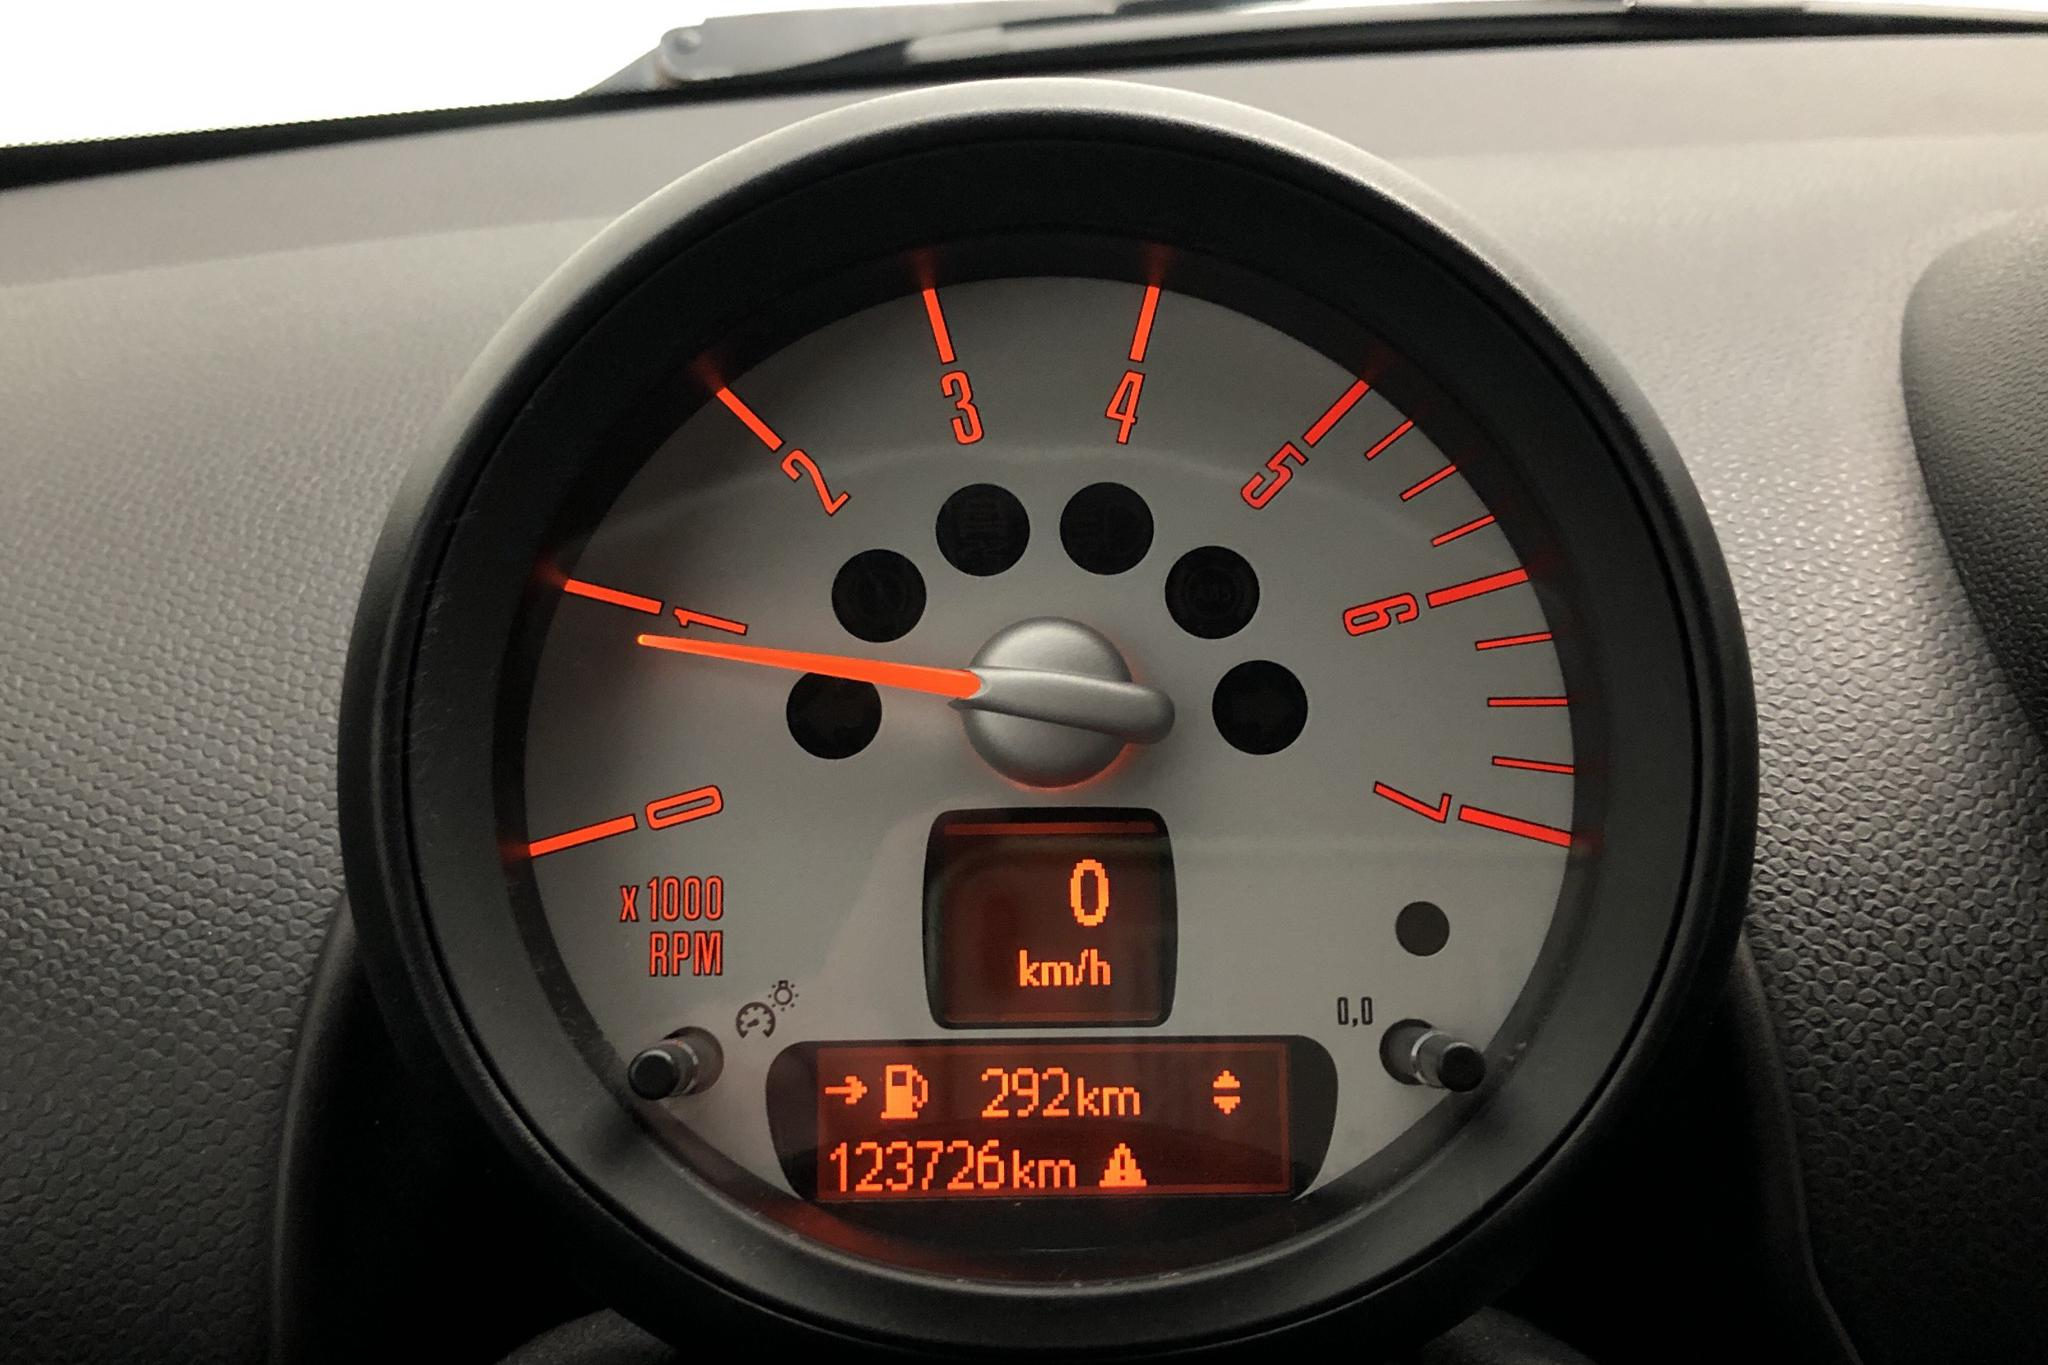 MINI Cooper SD Countryman (143hk) - 123 720 km - Manual - white - 2012